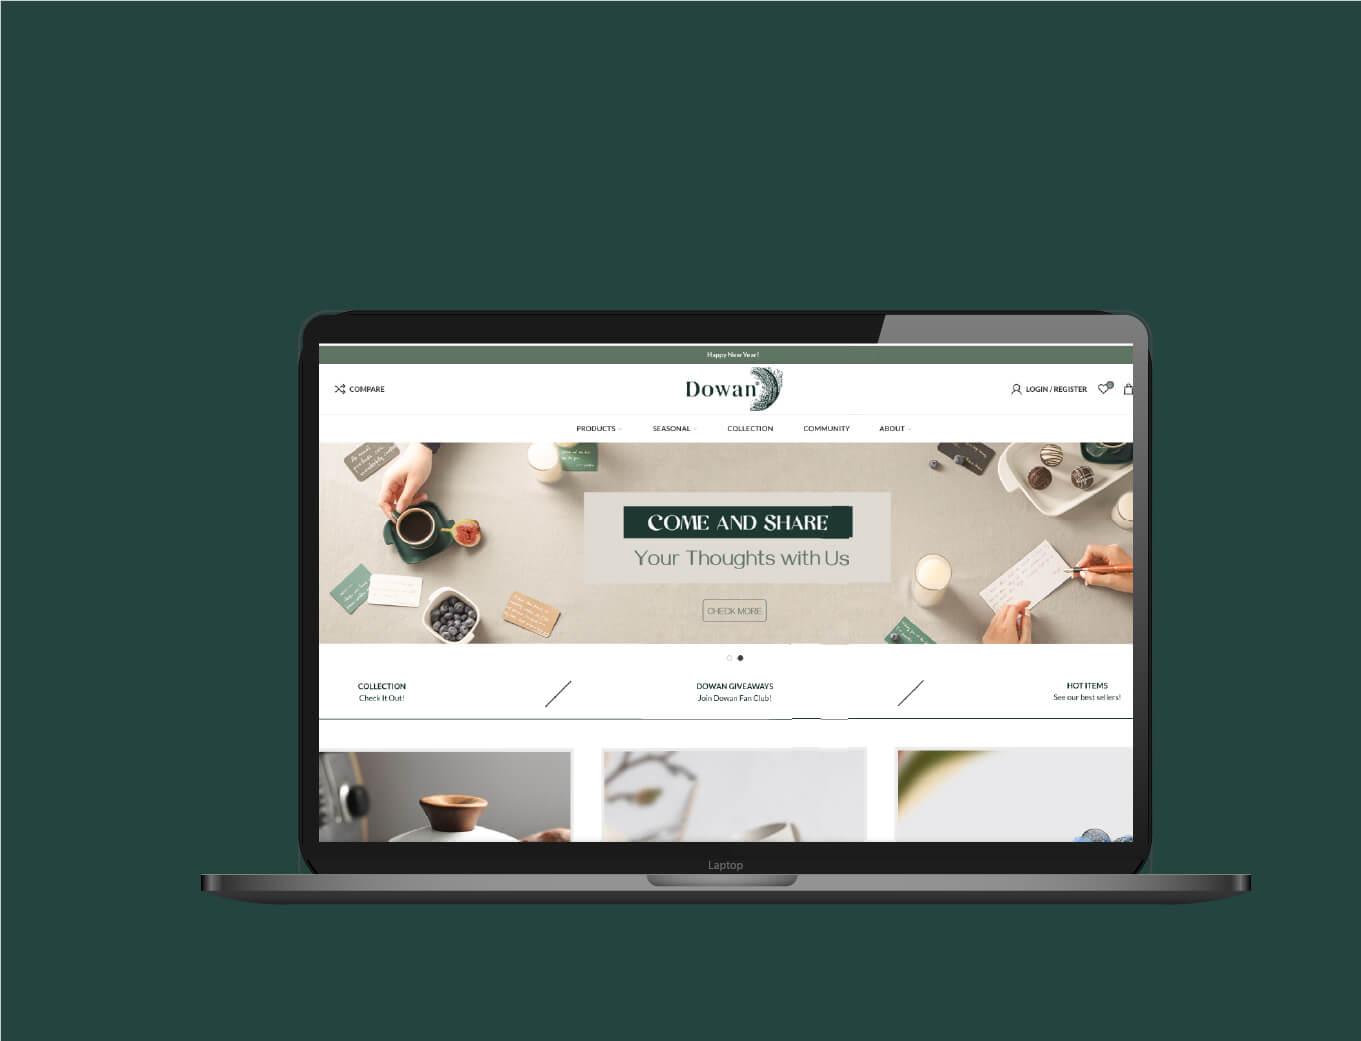 Dowan tableware lifestyle ceramics website branded and designed by Orange branding